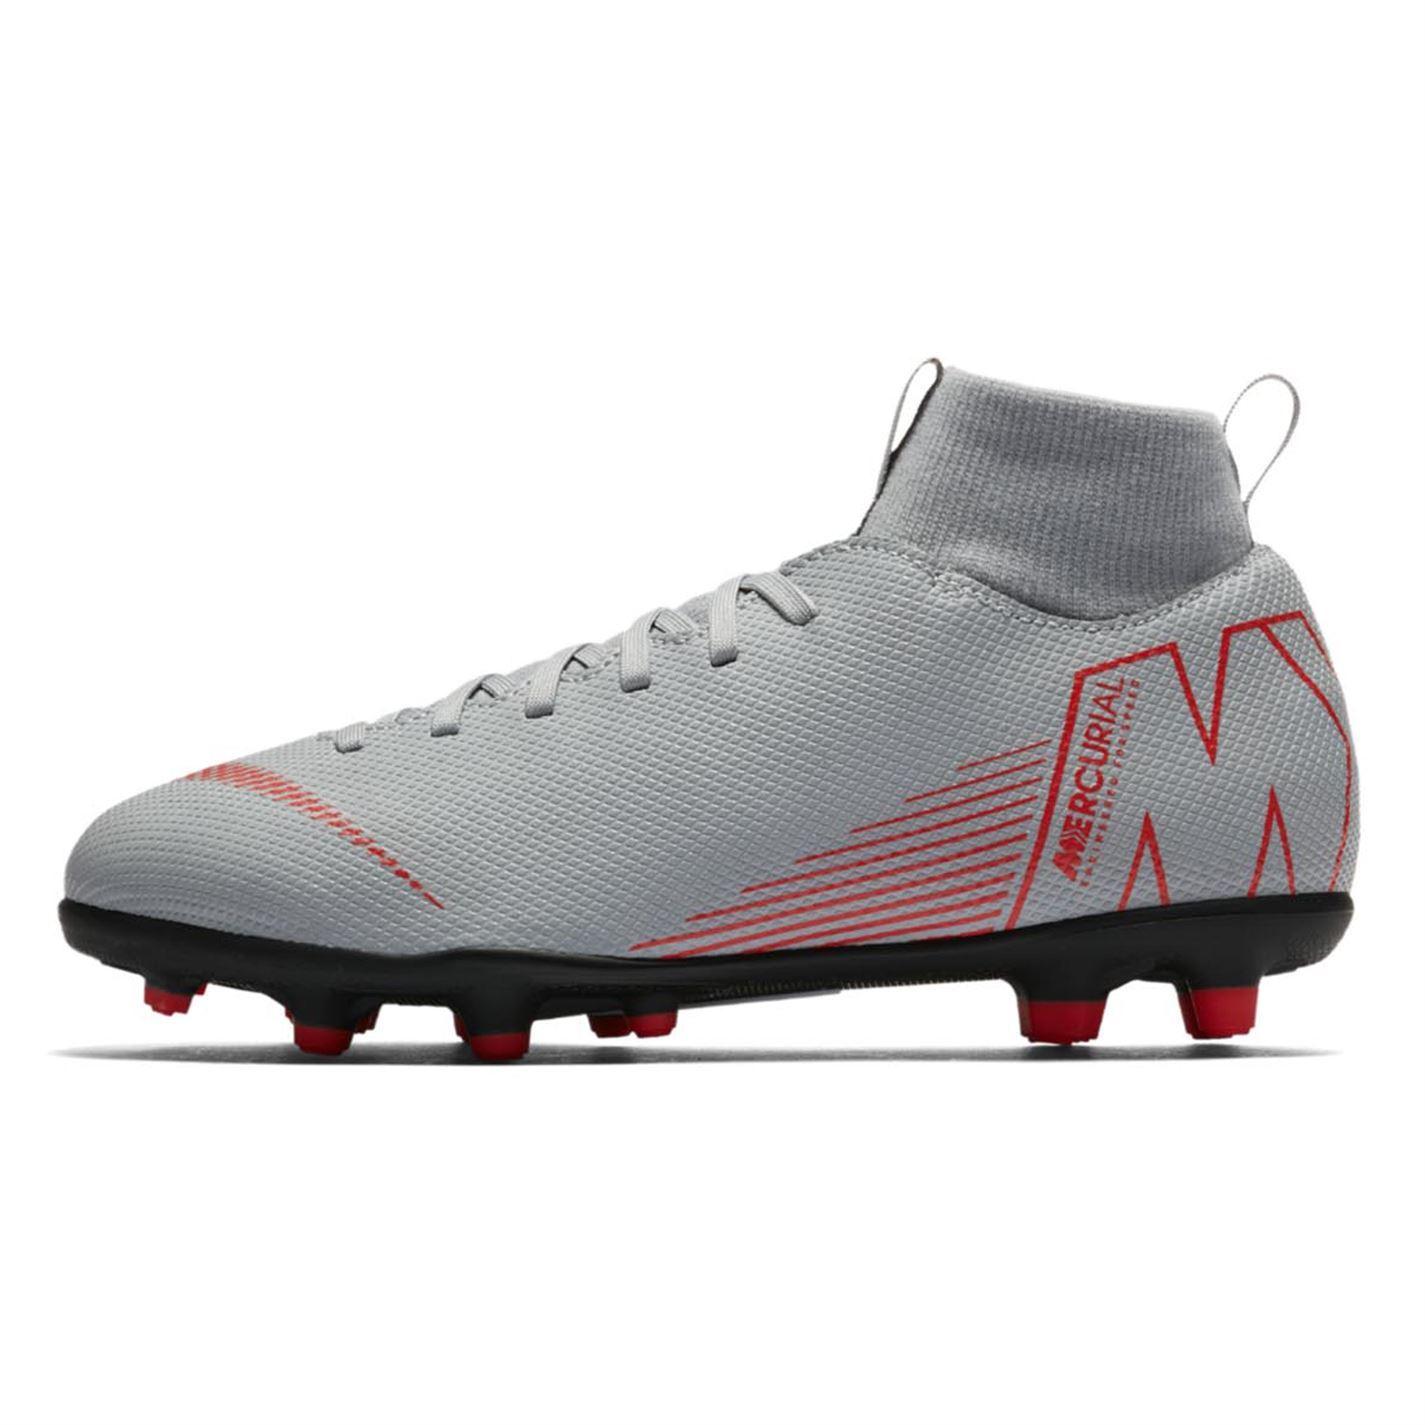 Nike-MERCURIAL-SUPERFLY-Club-DF-TERRA-FERMA-SCARPE-DA-CALCIO-JUNIOR-CALCIO-Cunei miniatura 9